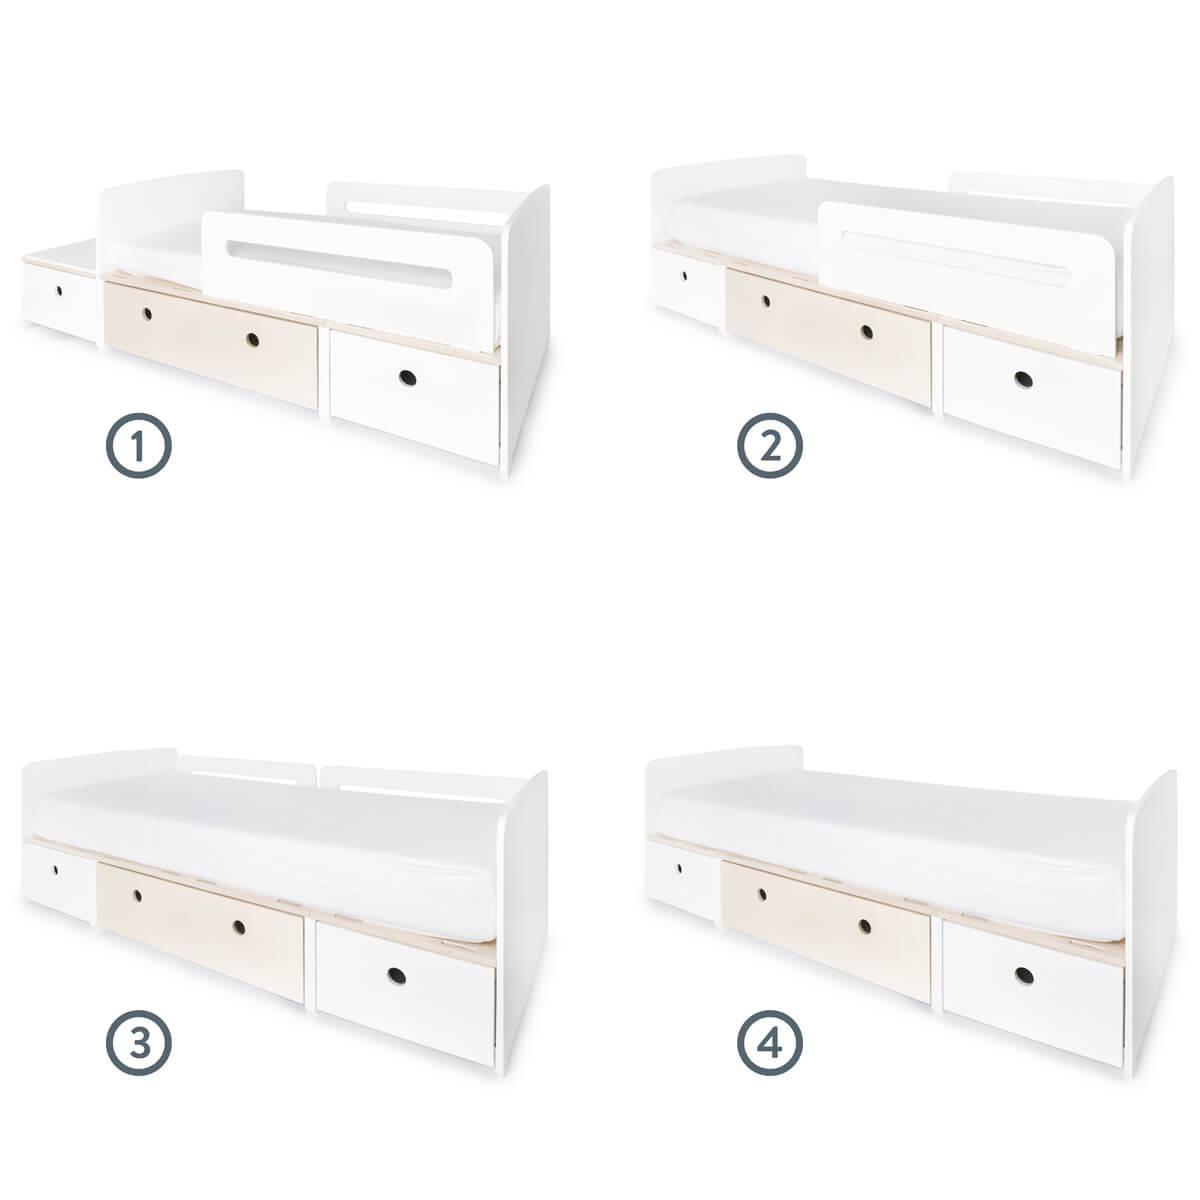 Juniorbett mitwachsend 90x150/200cm COLORFLEX white-white wash-white